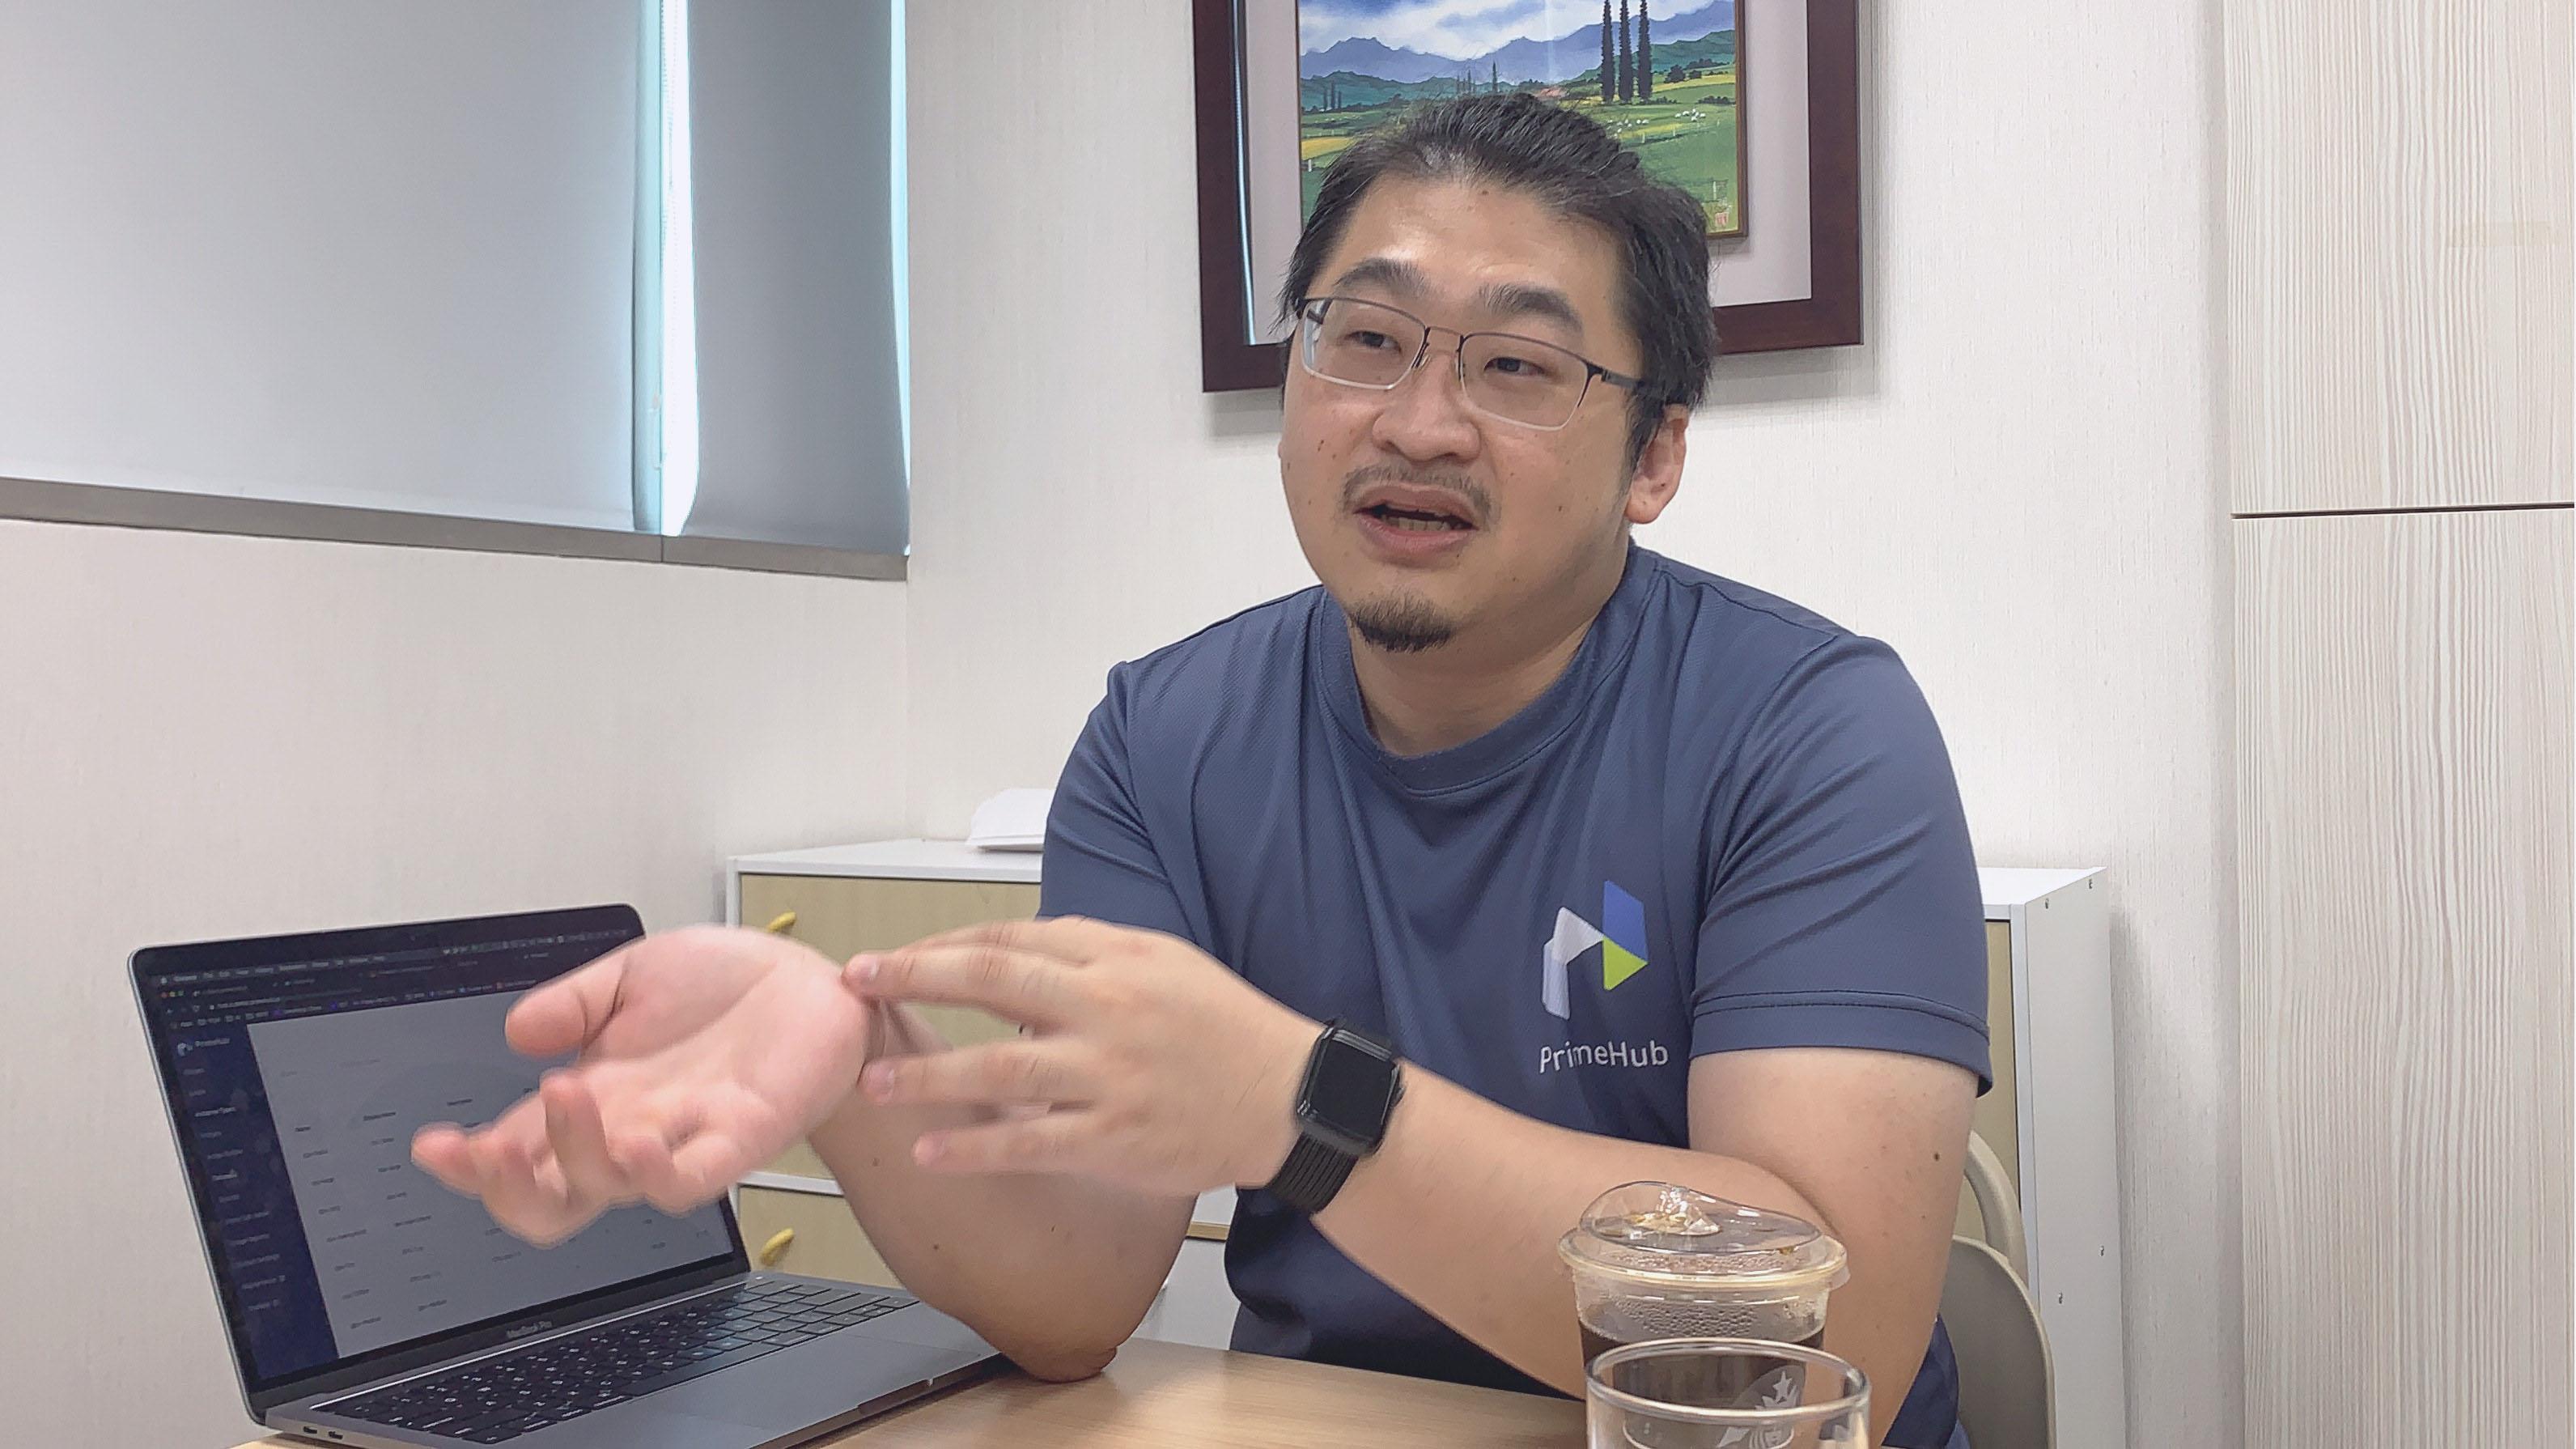 InfuseAI 共同創辦人兼營運長薛良斌展示 PrimeHub 產品介面